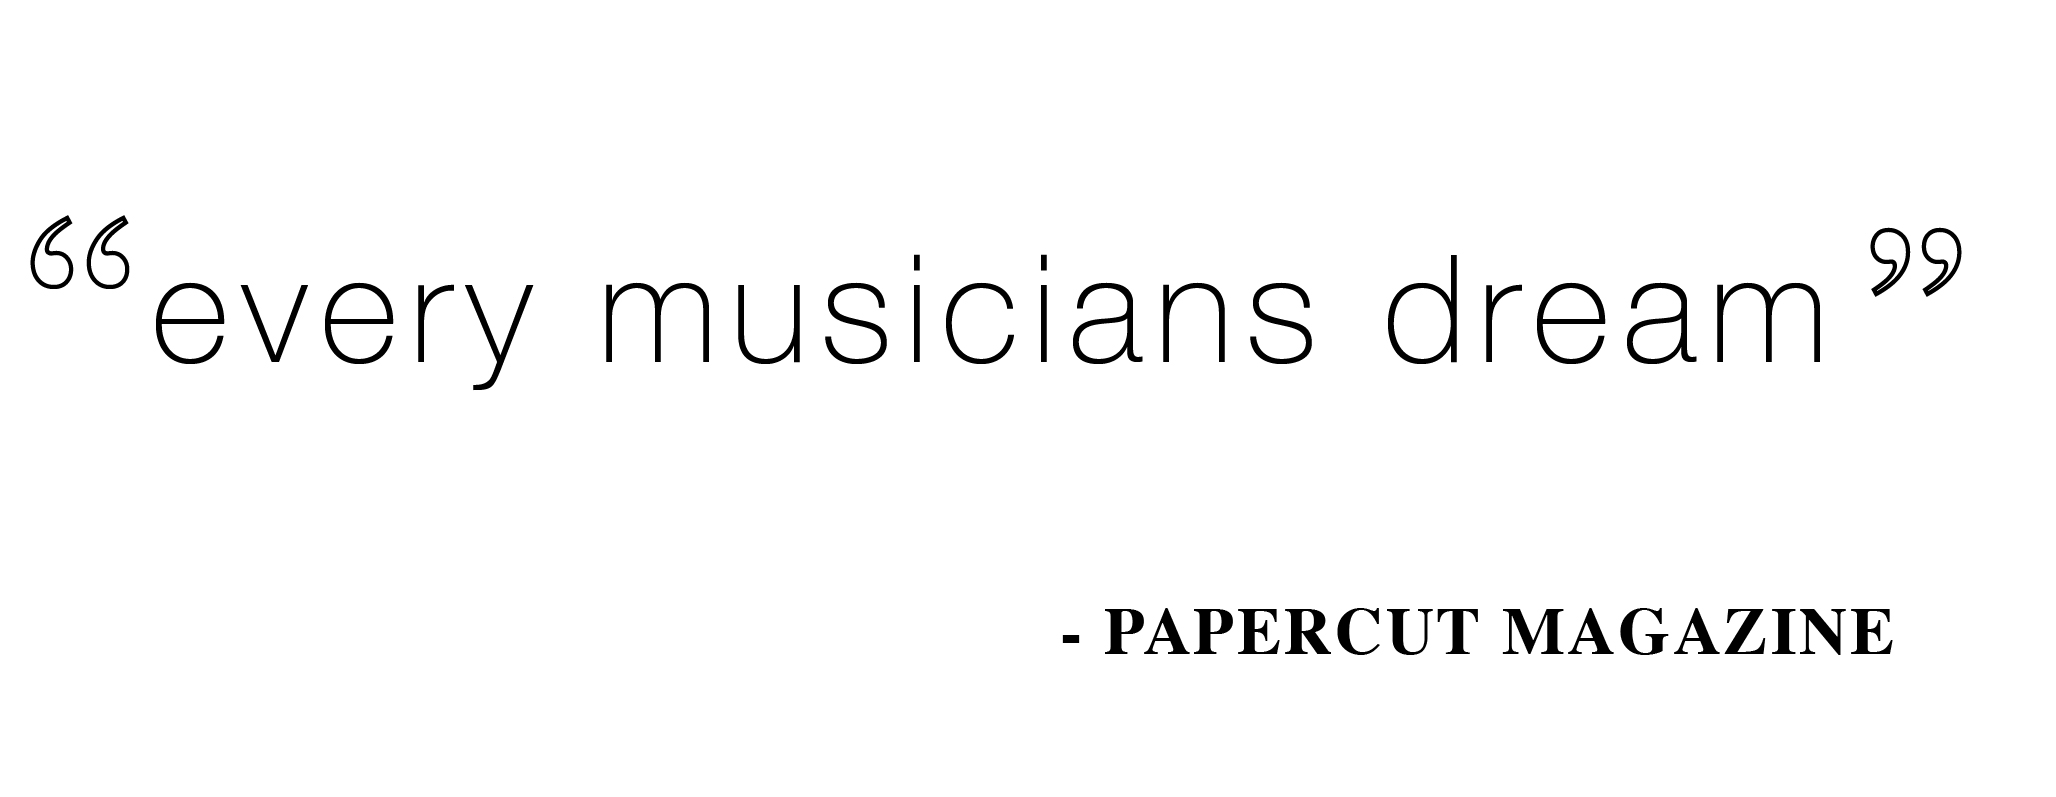 Papercut Quote-01.jpg